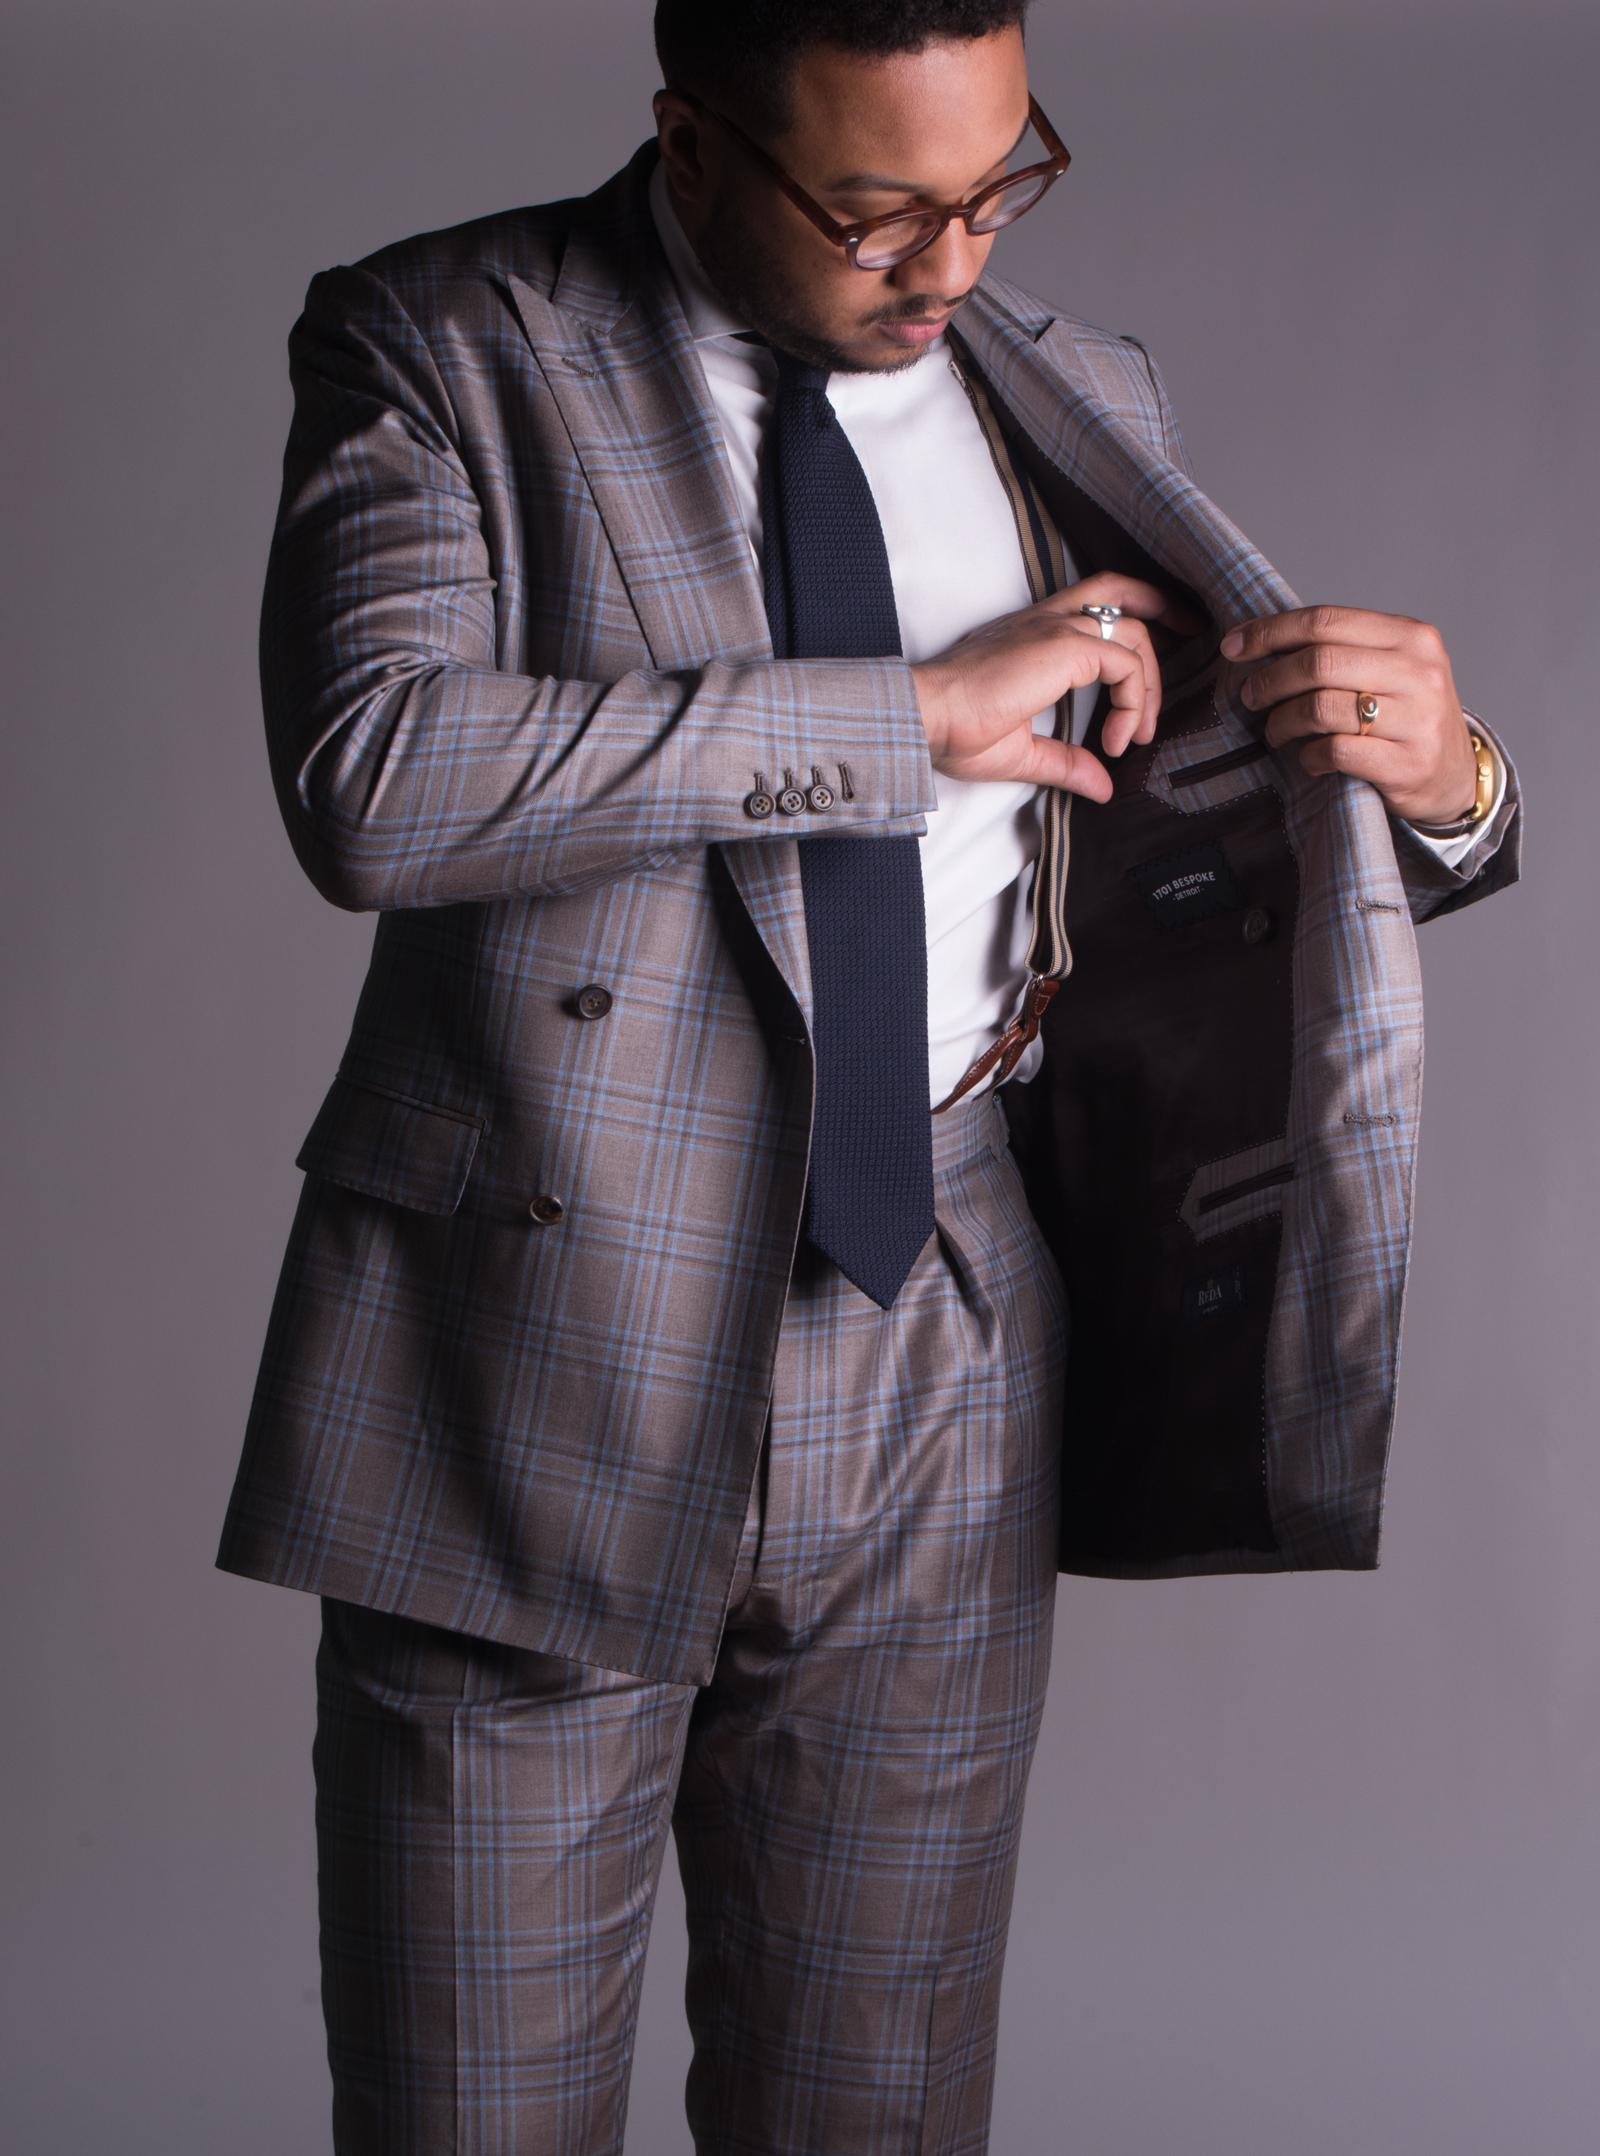 custom-suit-detroit-double-breast-grenadine-tie